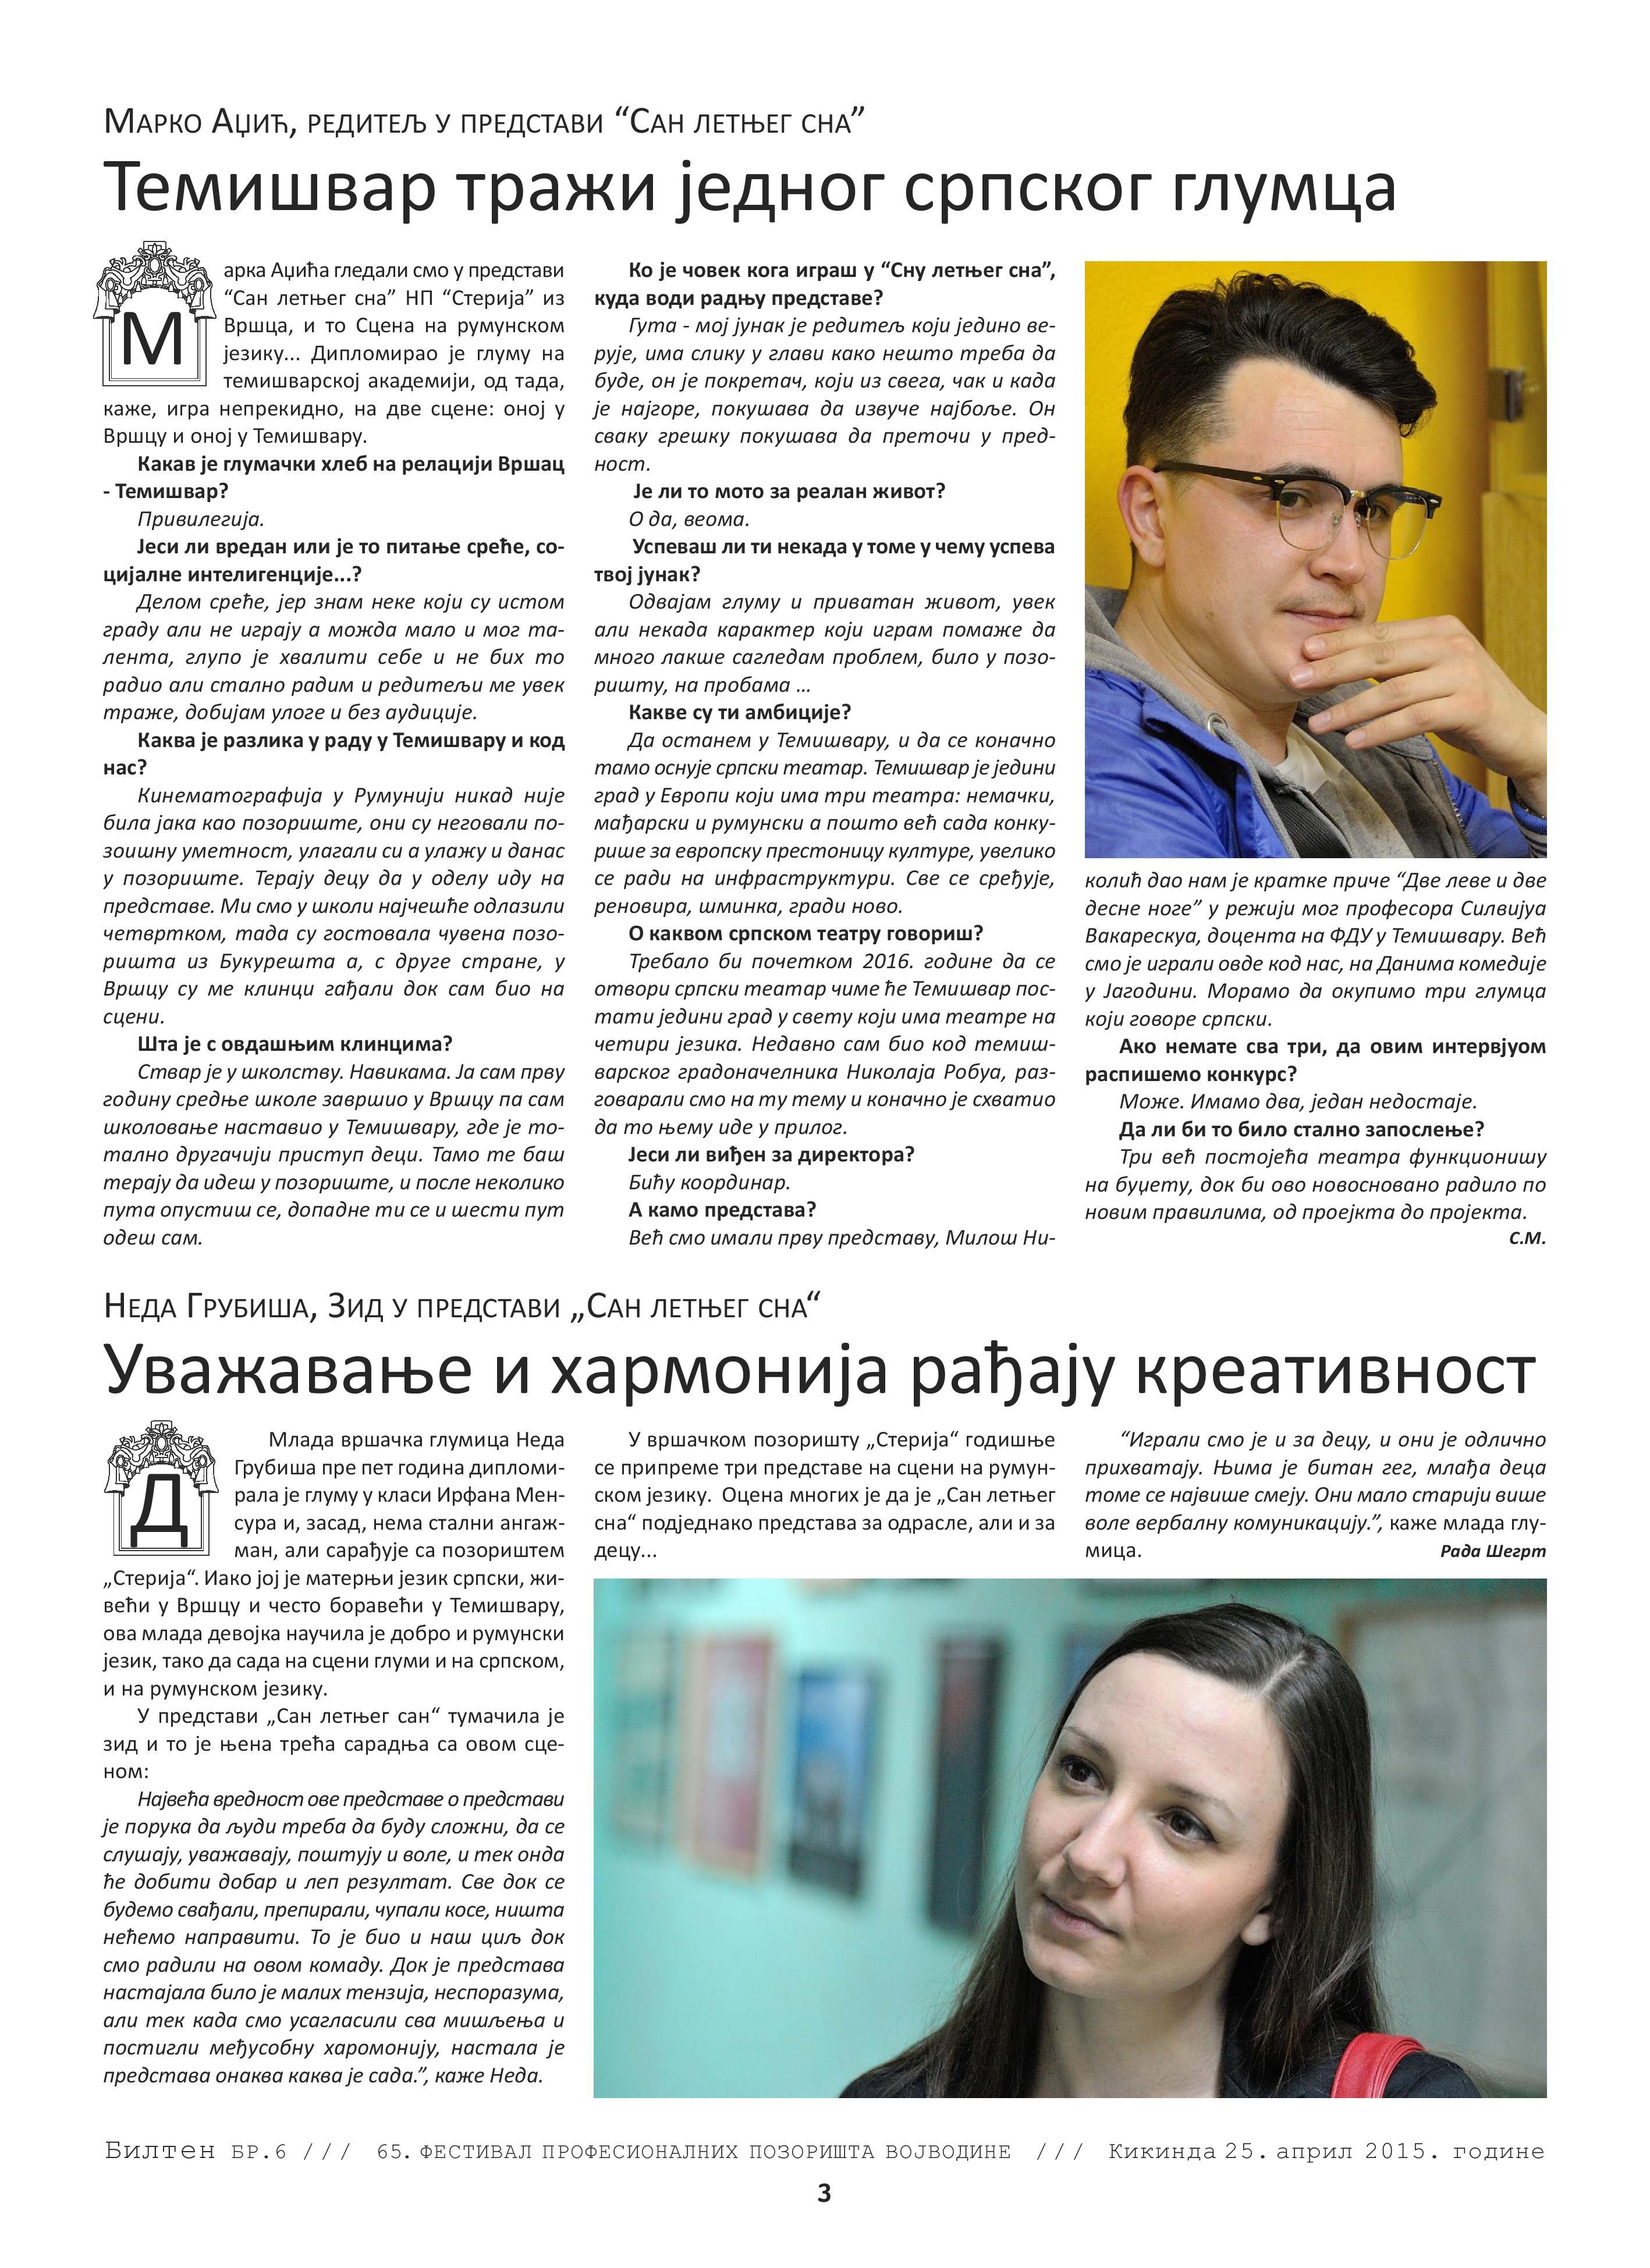 BILTEN_06_25 april-page-003